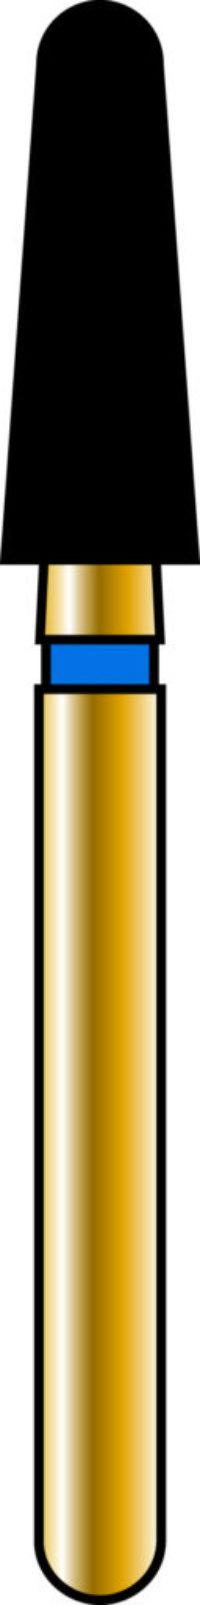 Round End Taper 25-7mm Gold Diamond Bur